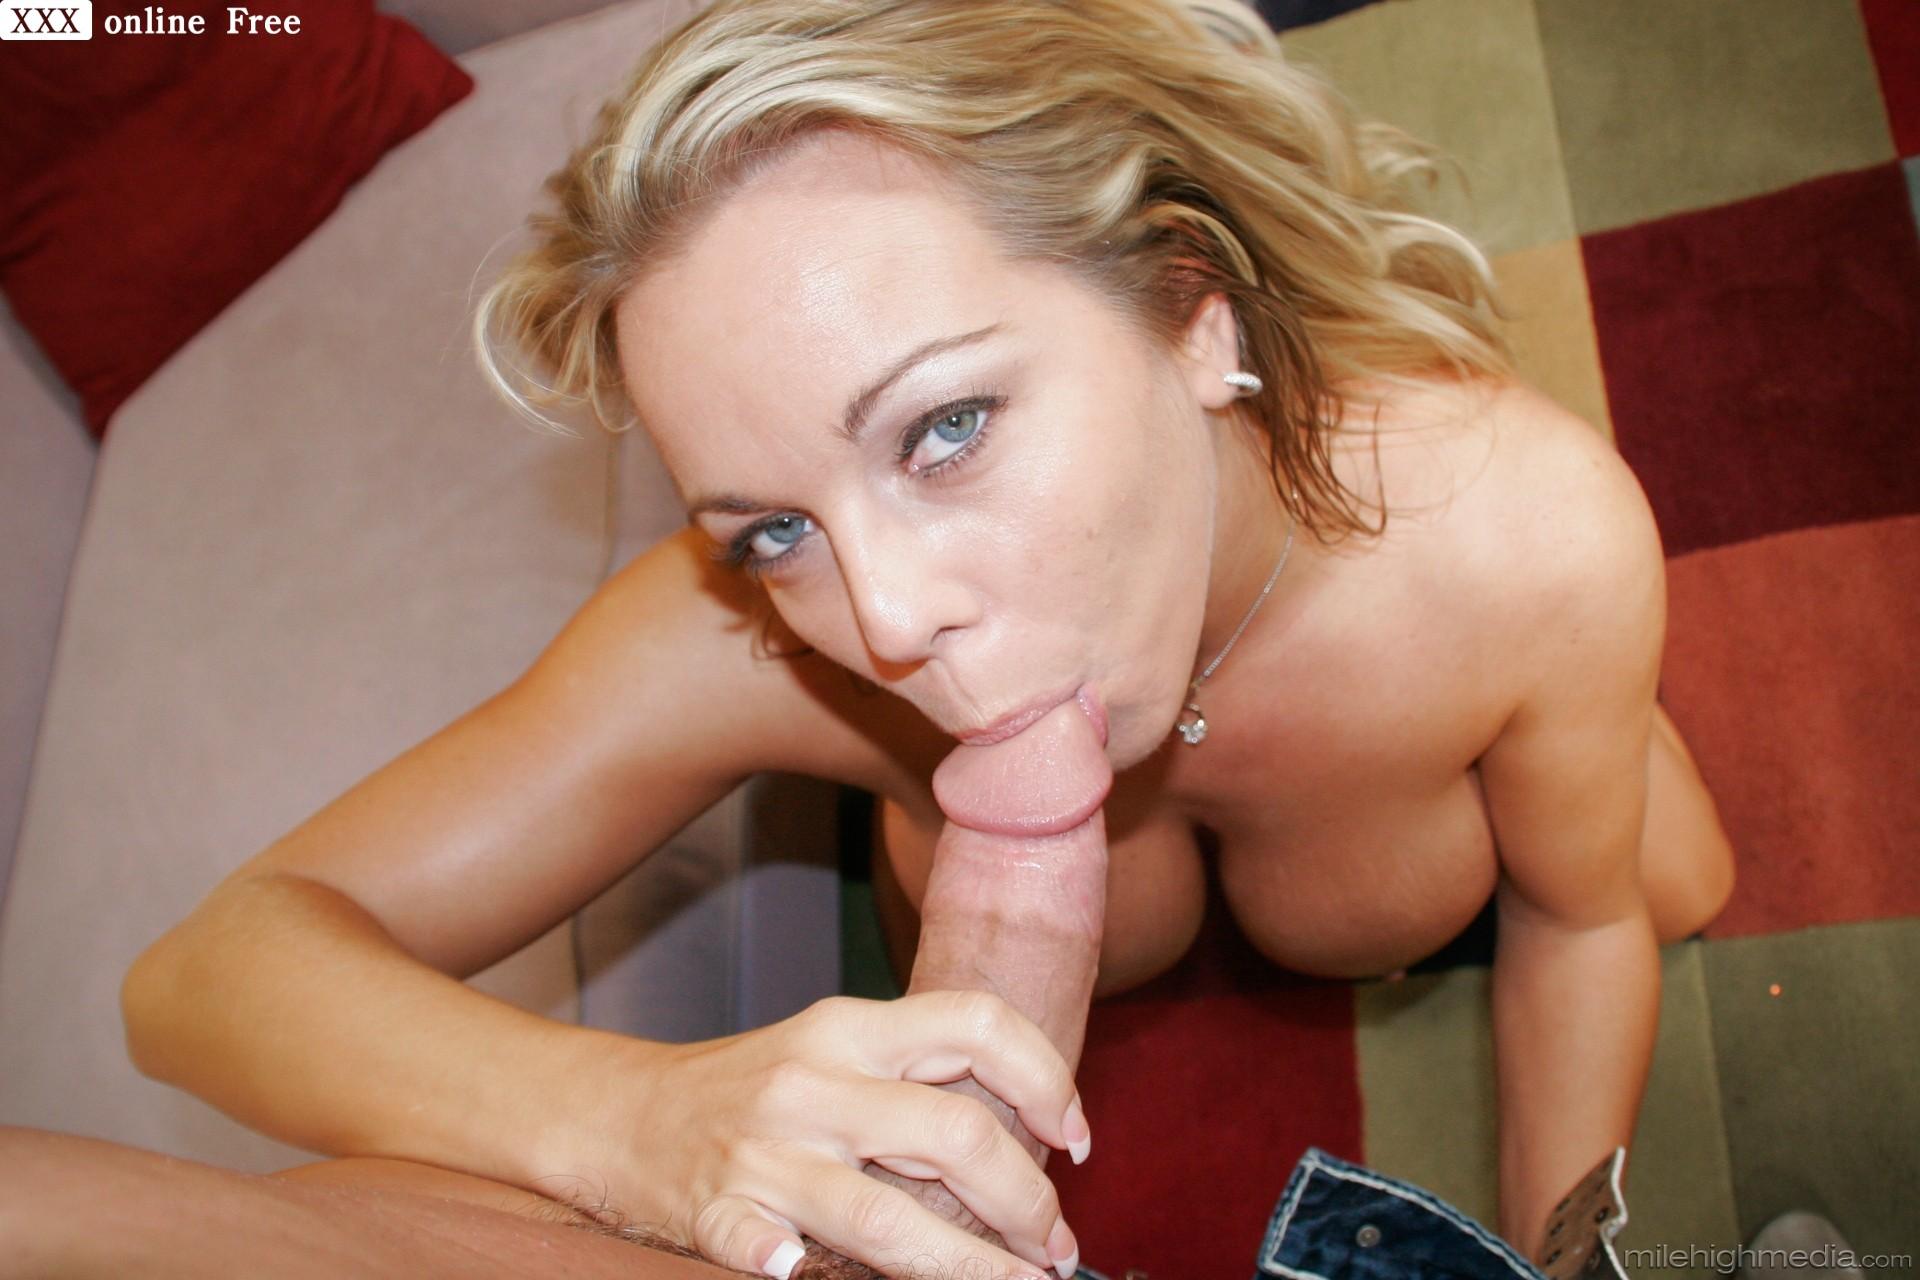 Amber Lynn Free Pics big boob beauties #02, scene #04 milehighselection 2014